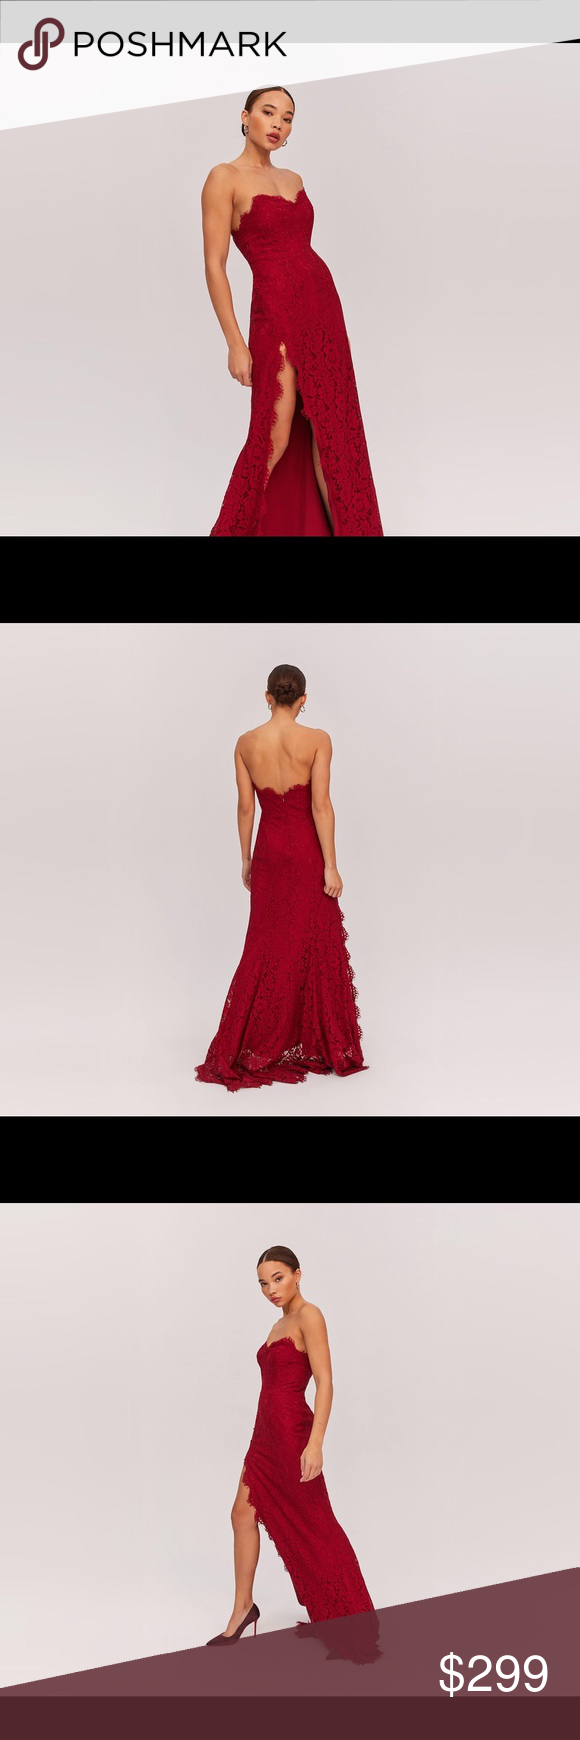 Fame And Partners Prom Dress Twilight Dress Dress Twilight Prom Dresses Cute Prom Dresses [ 1740 x 580 Pixel ]